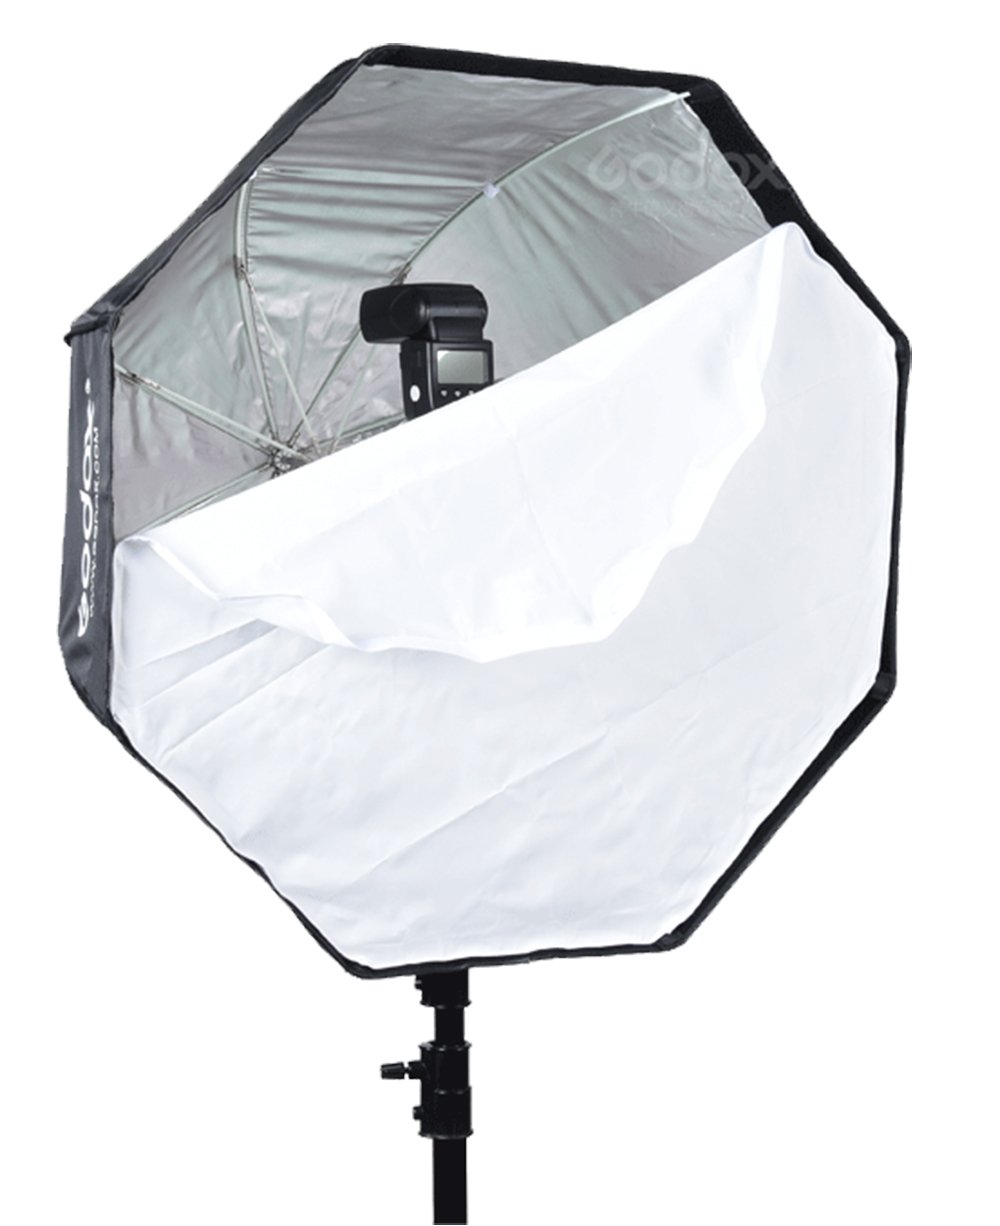 Godox Portable 95cm/37.5'' Umbrella Octagon Softbox Reflector with Carrying Bag for Studio Photo Flash Speedlight by Godox (Image #5)